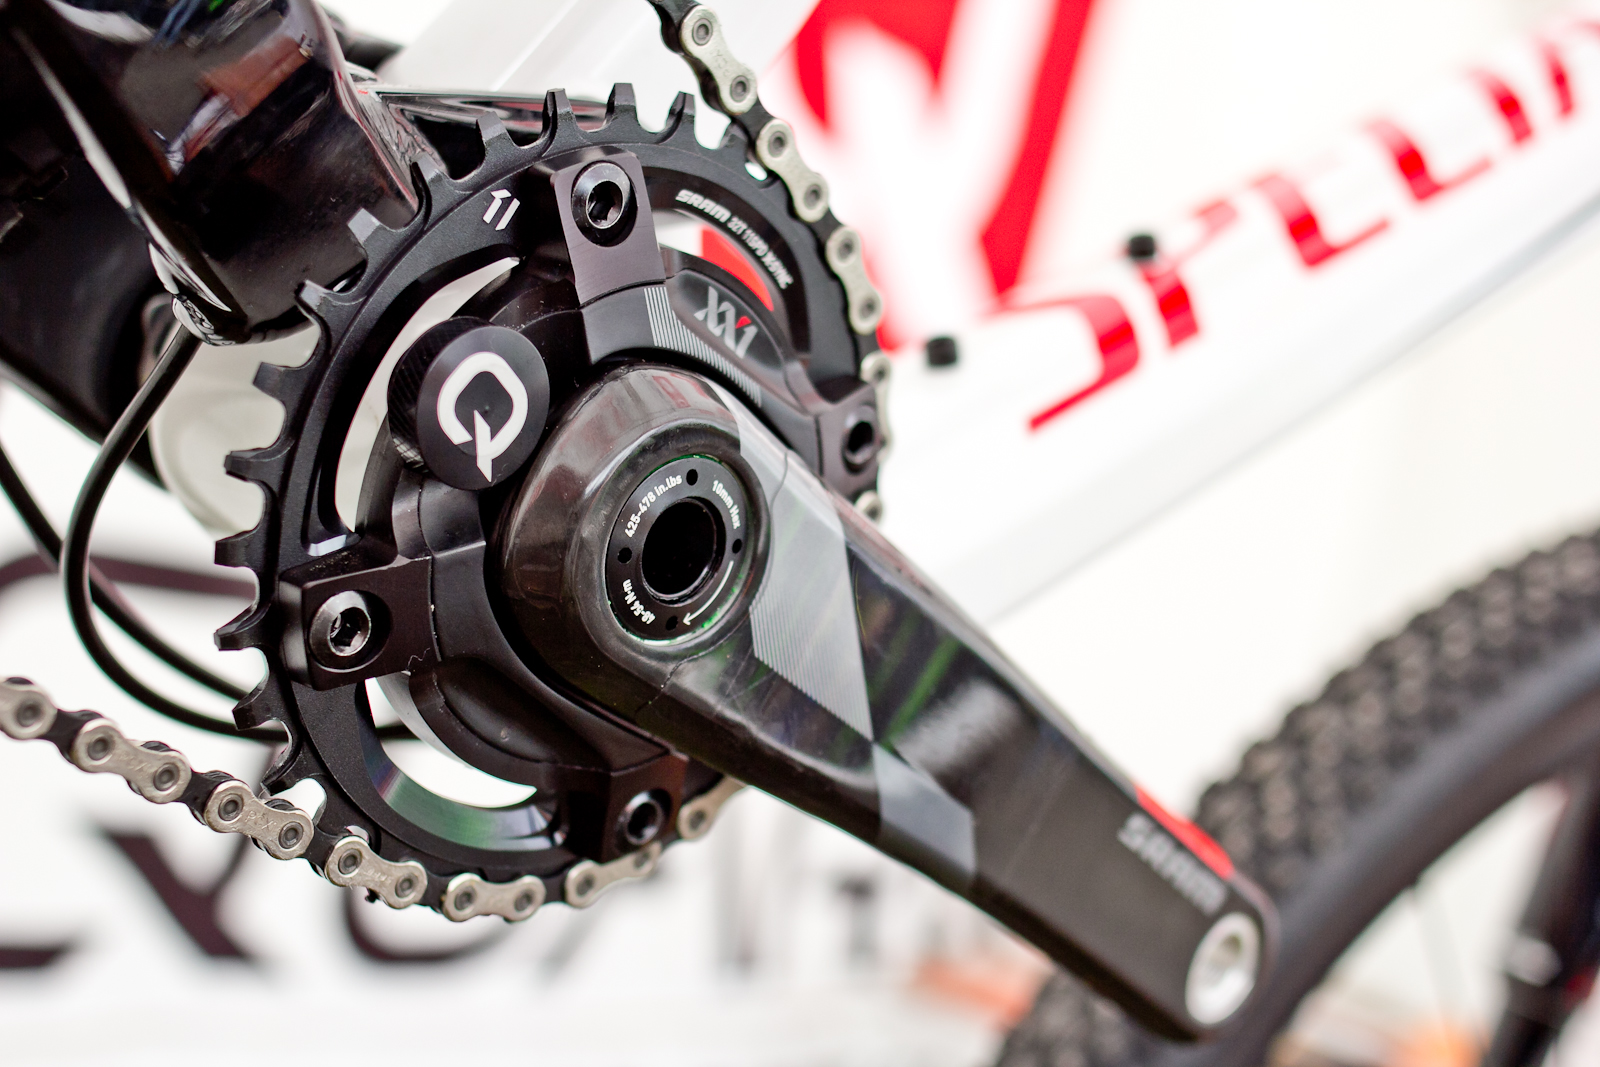 Drag Racing Helmets >> SRAM XX1 Quarq Power Meter Cranks - 2015 Mountain Bike Components at Eurobike 2014 - Mountain ...